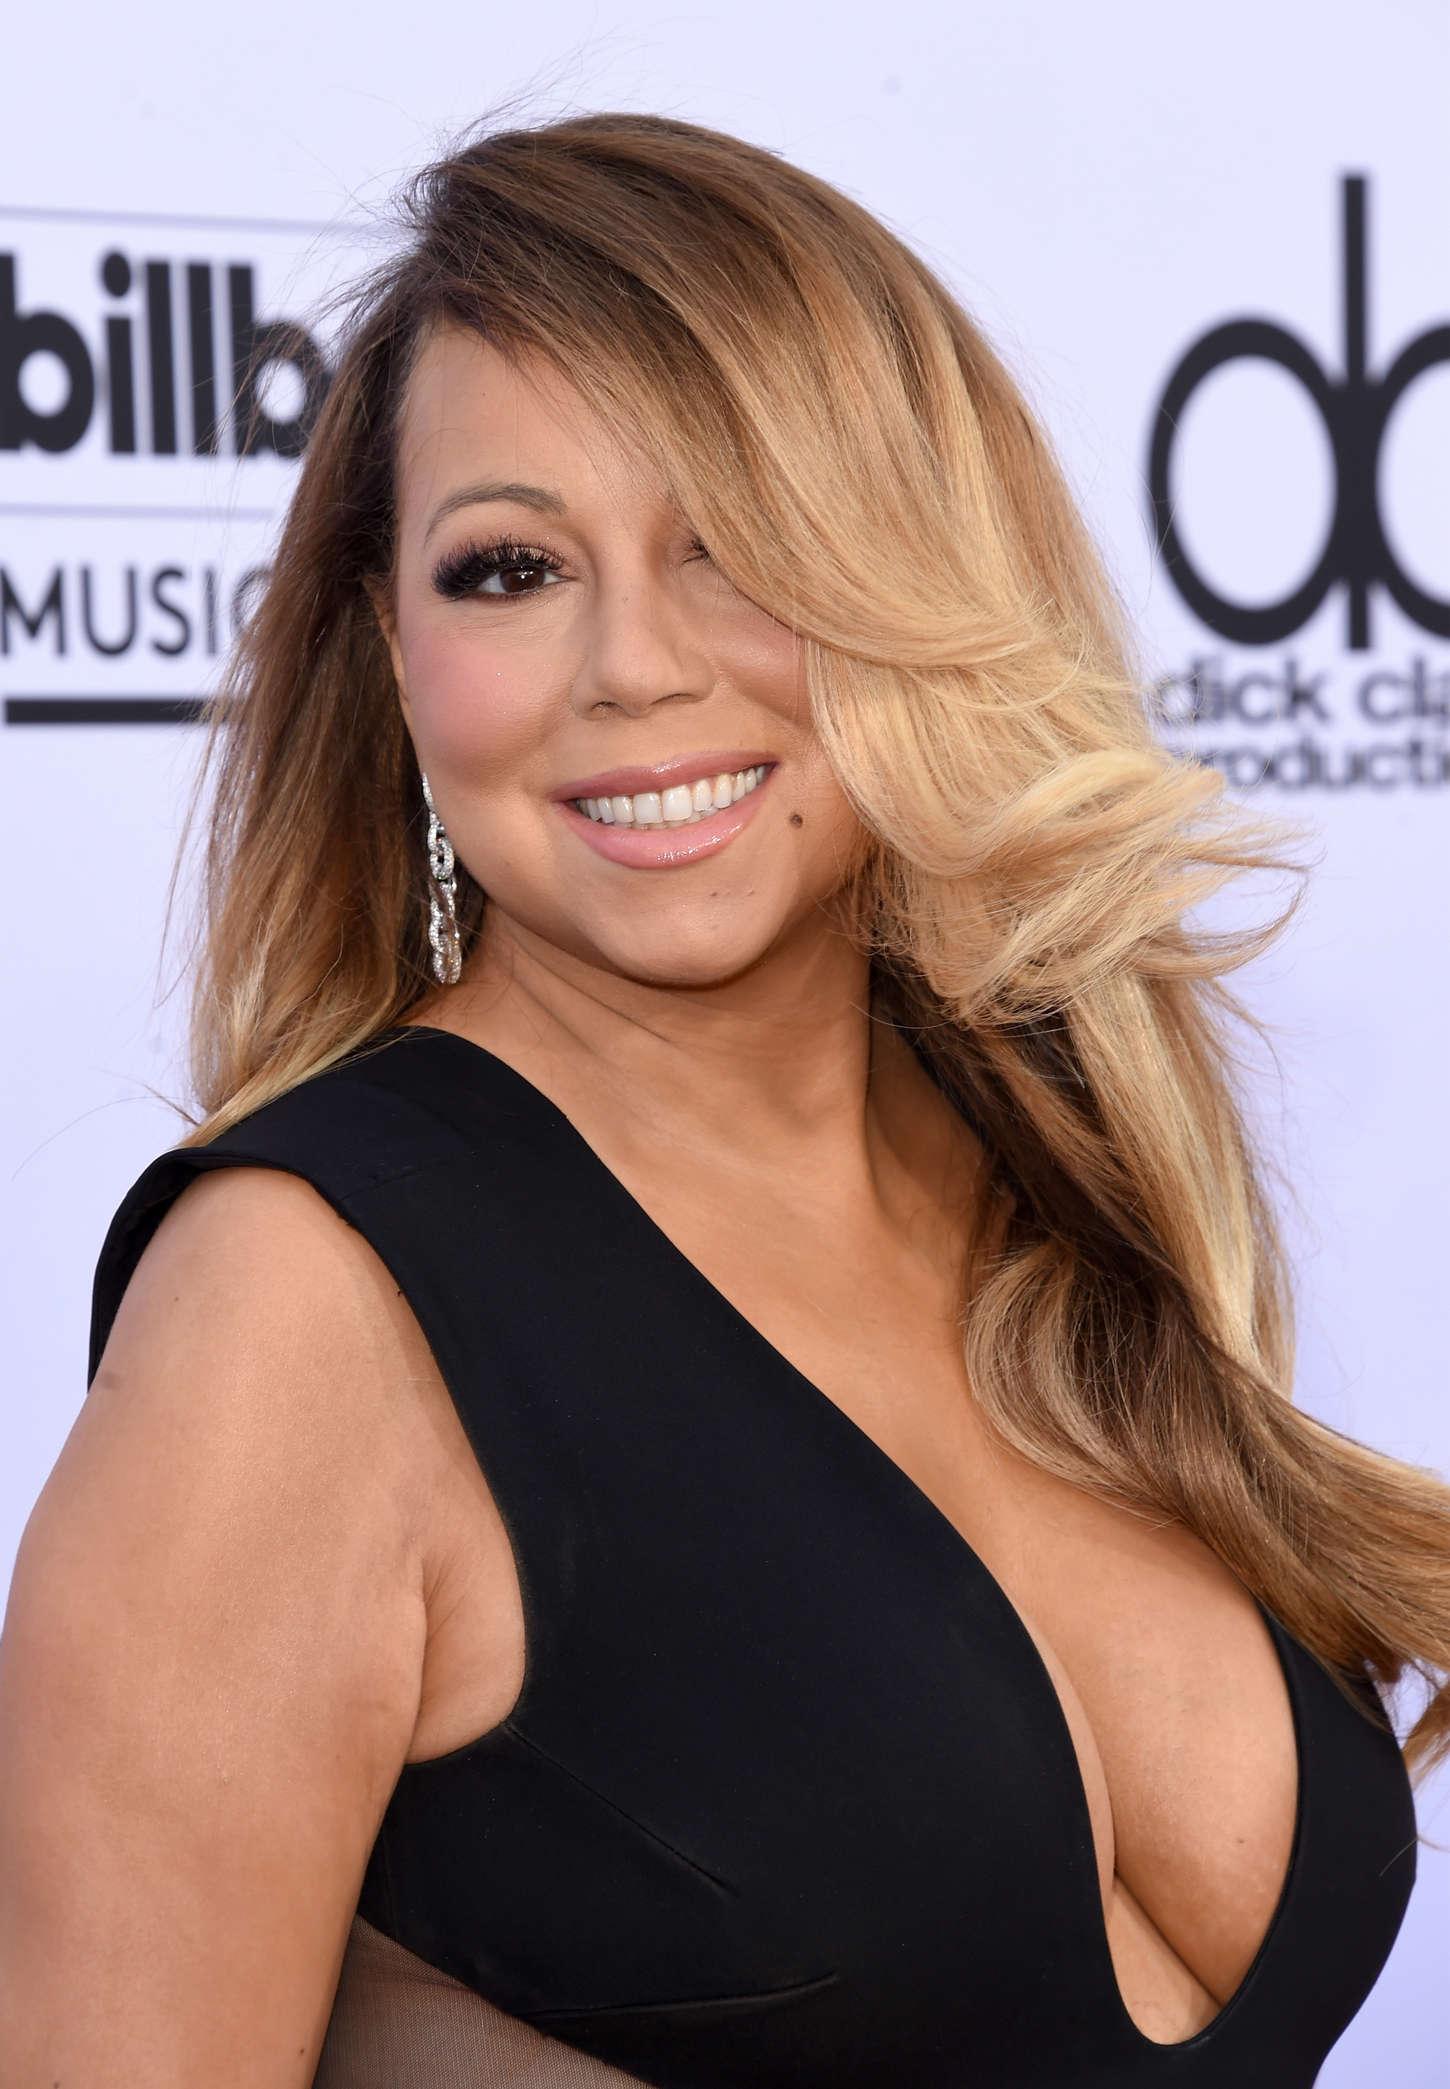 Mariah Carey - Billboard Music Awards 2015 in Las Vegas